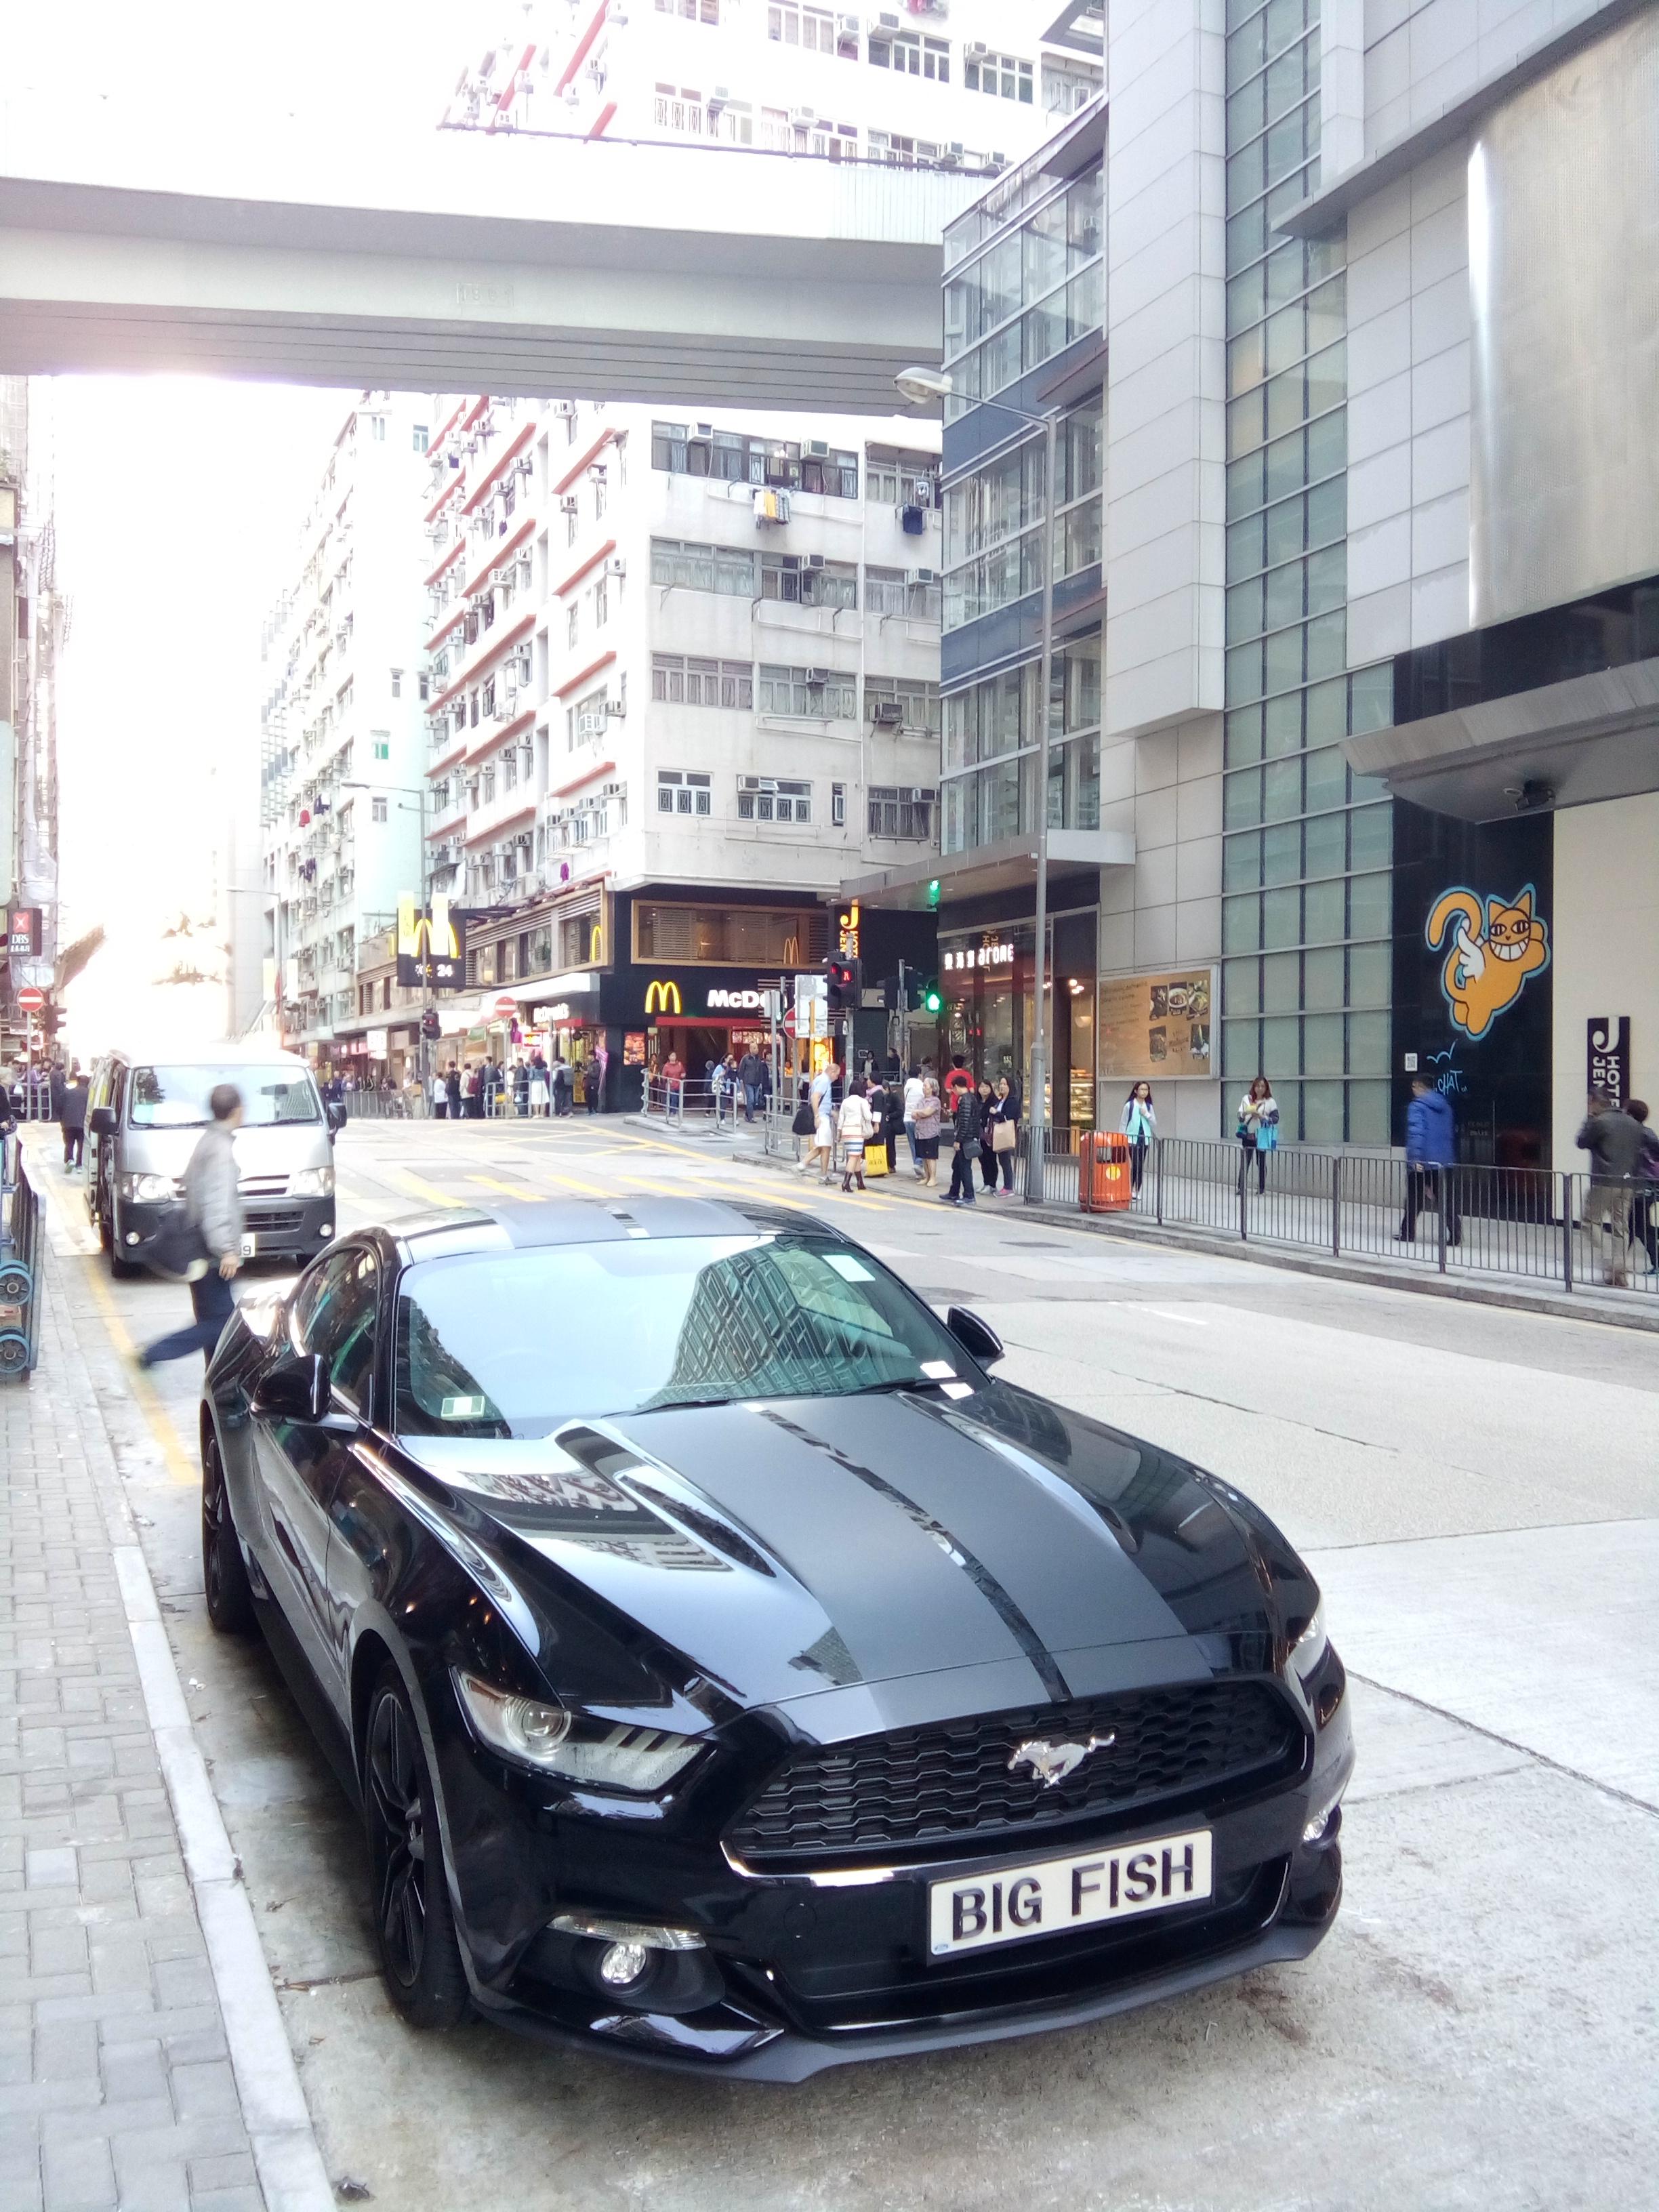 Filehk 石塘 shek tong tsui 野馬跑車 ford mustang race car parking sidewalk in black head queens road west nov 2016 lnv3 jpg